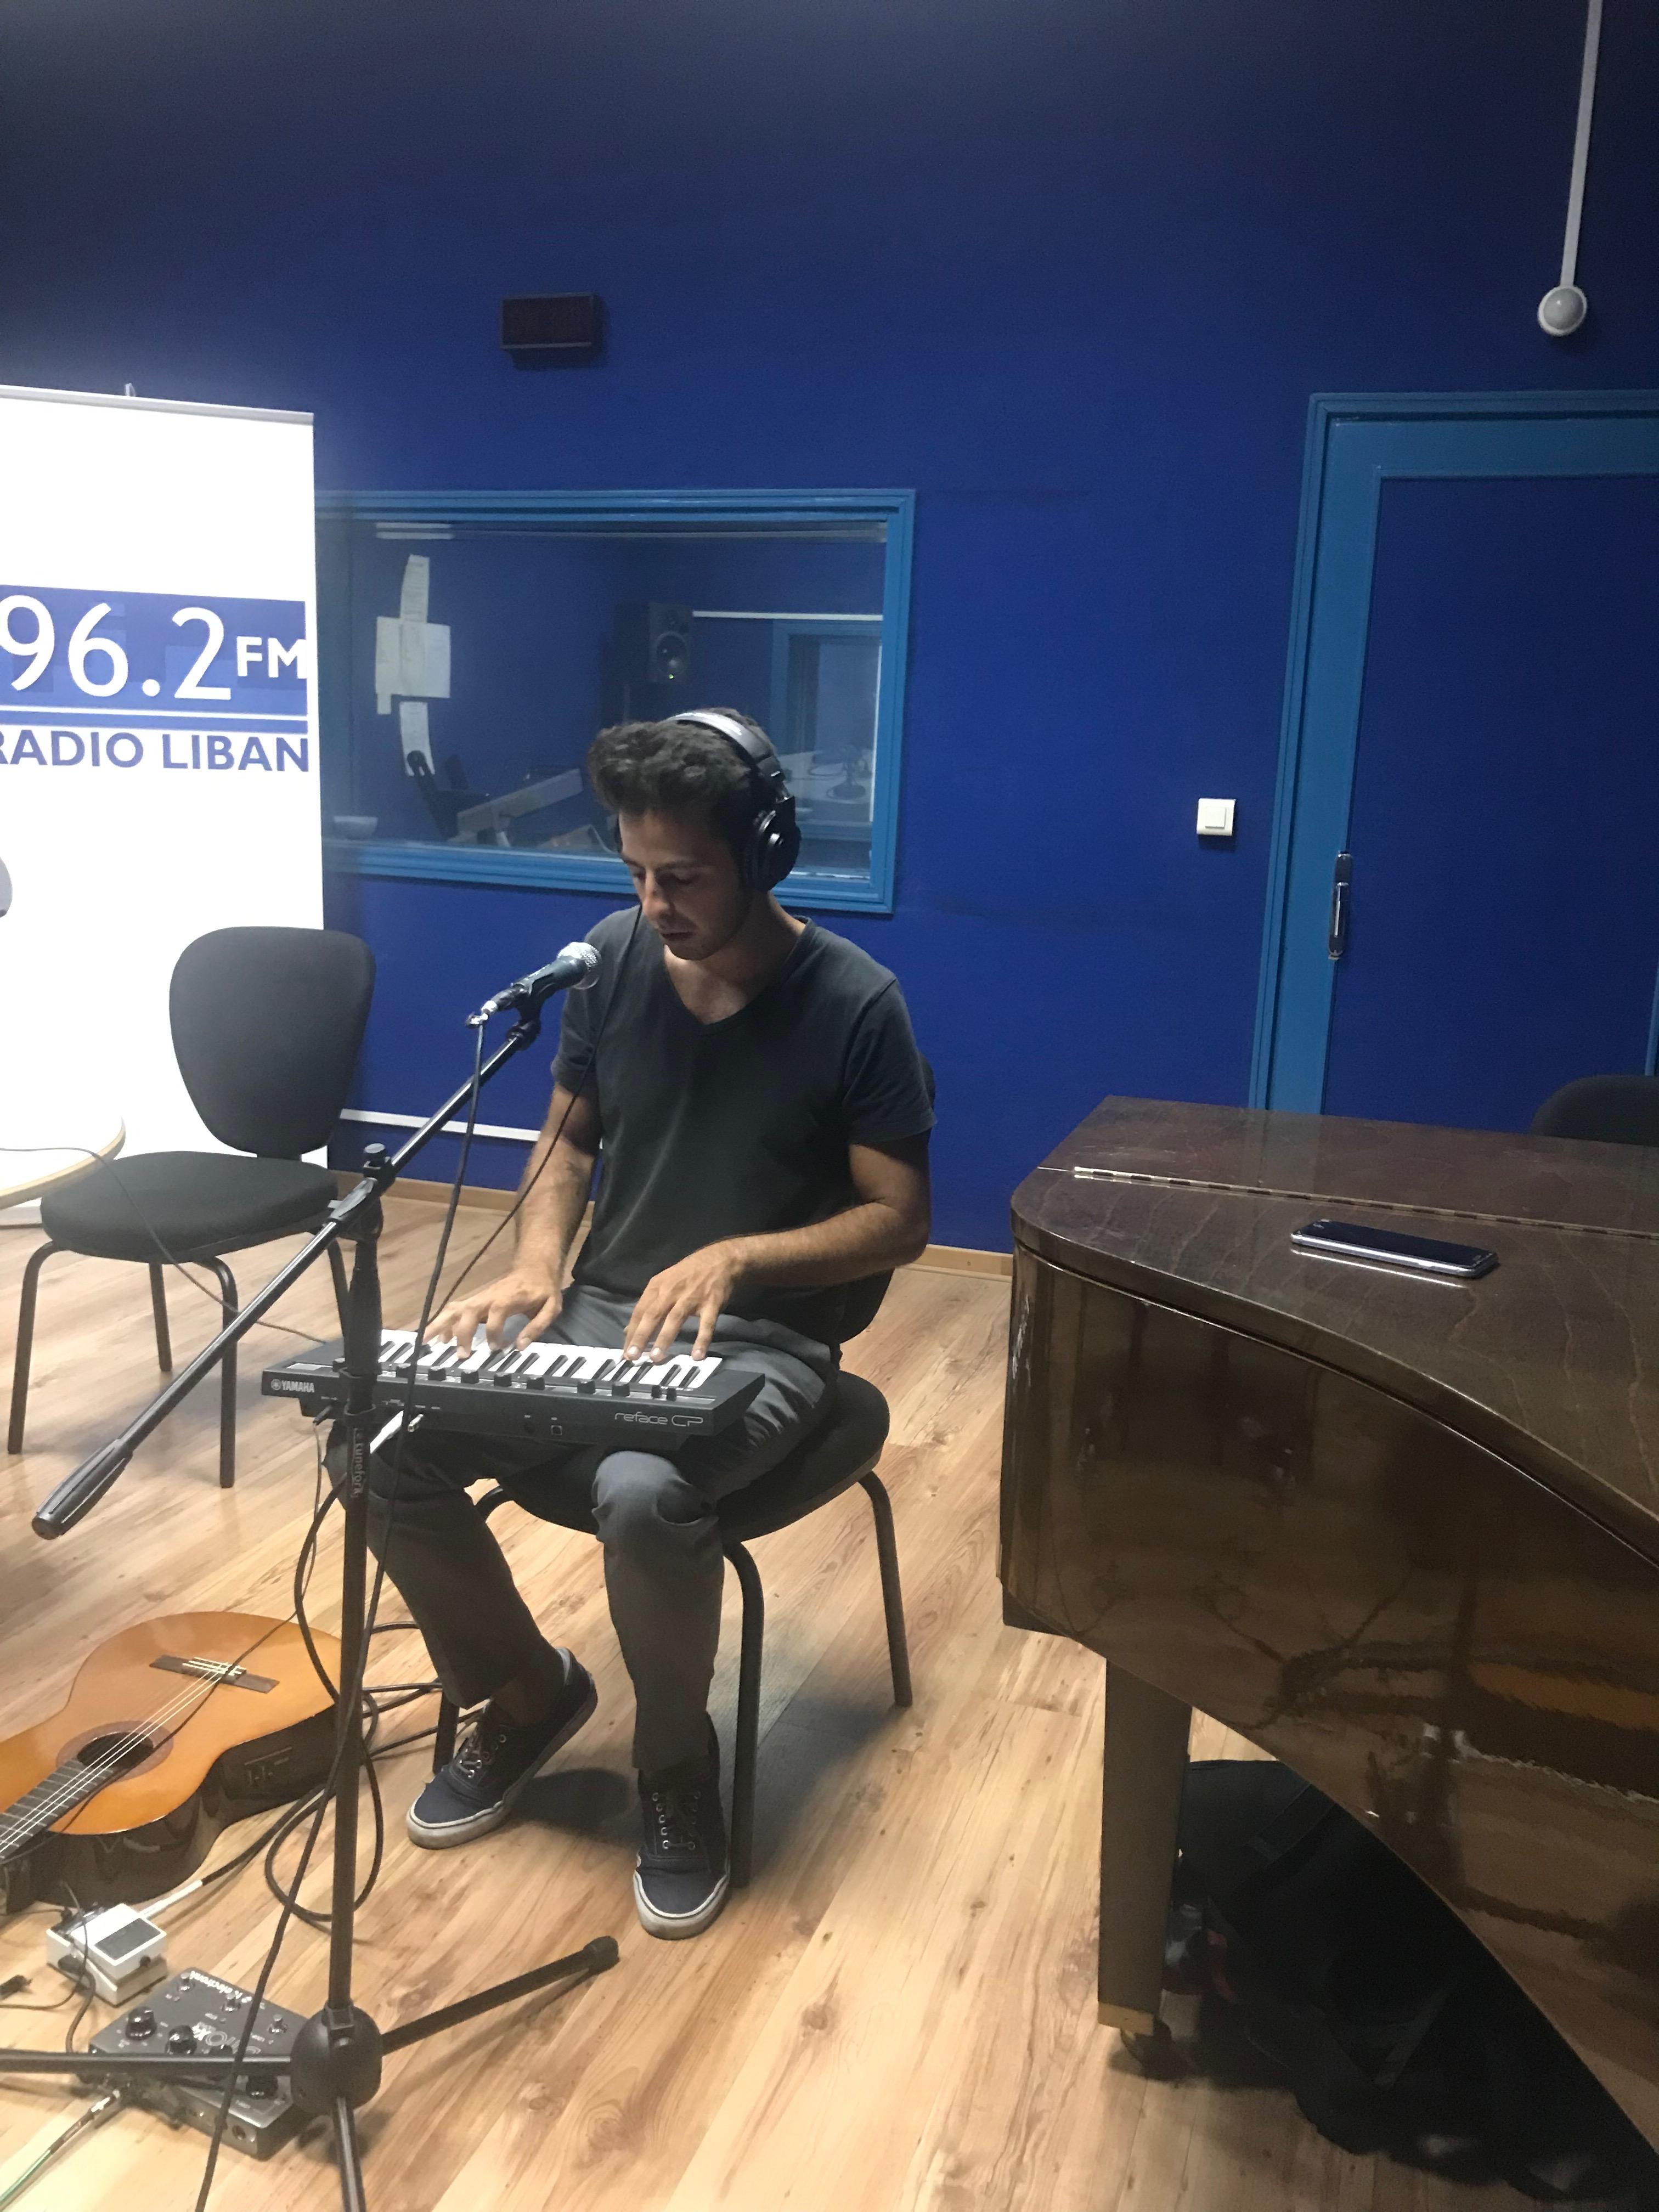 Ruptured Records – Lebanese independent music label // Radio